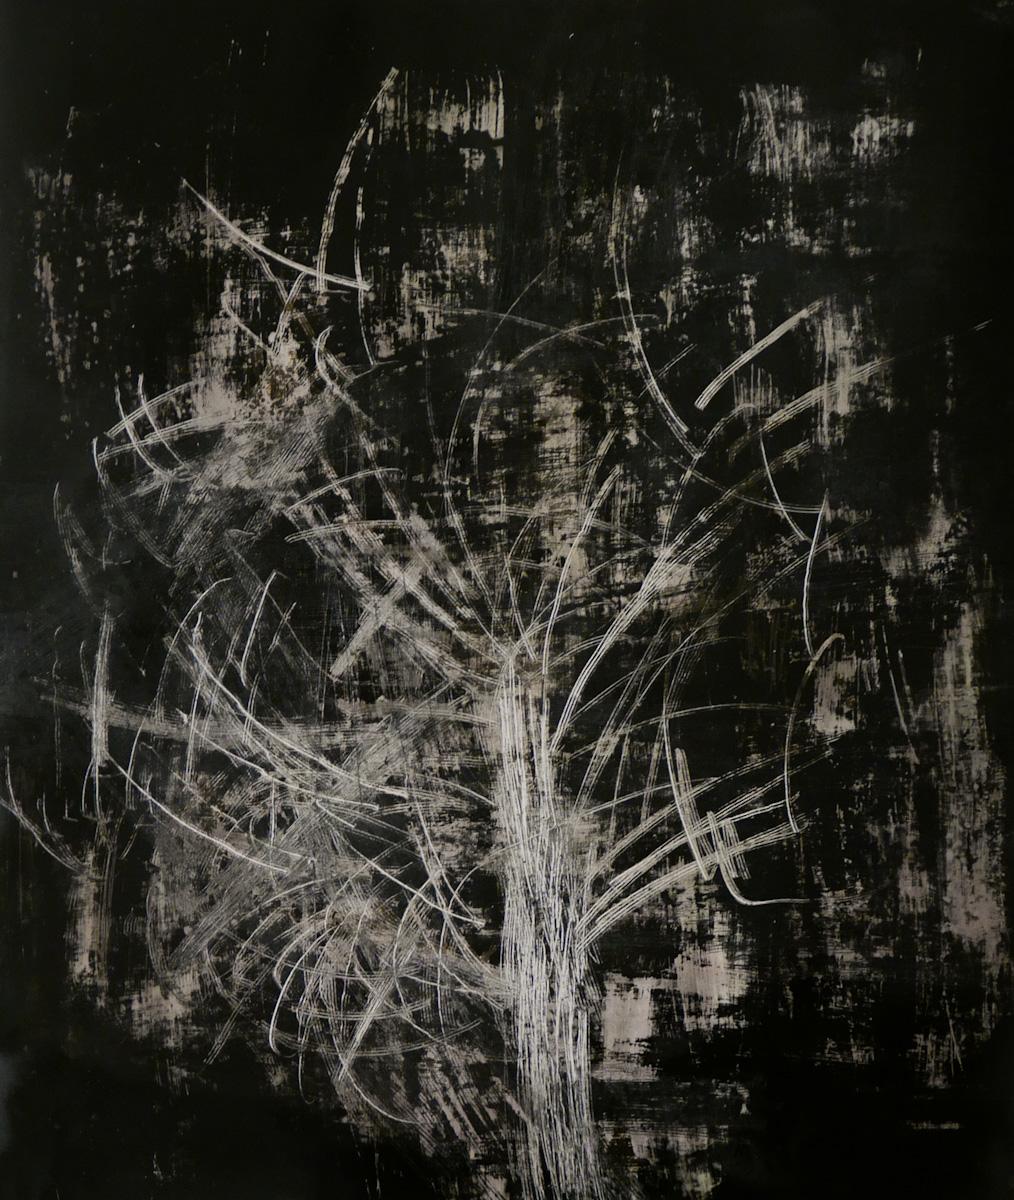 tree #13 - graffi e ruggine su carta fotografica analogica